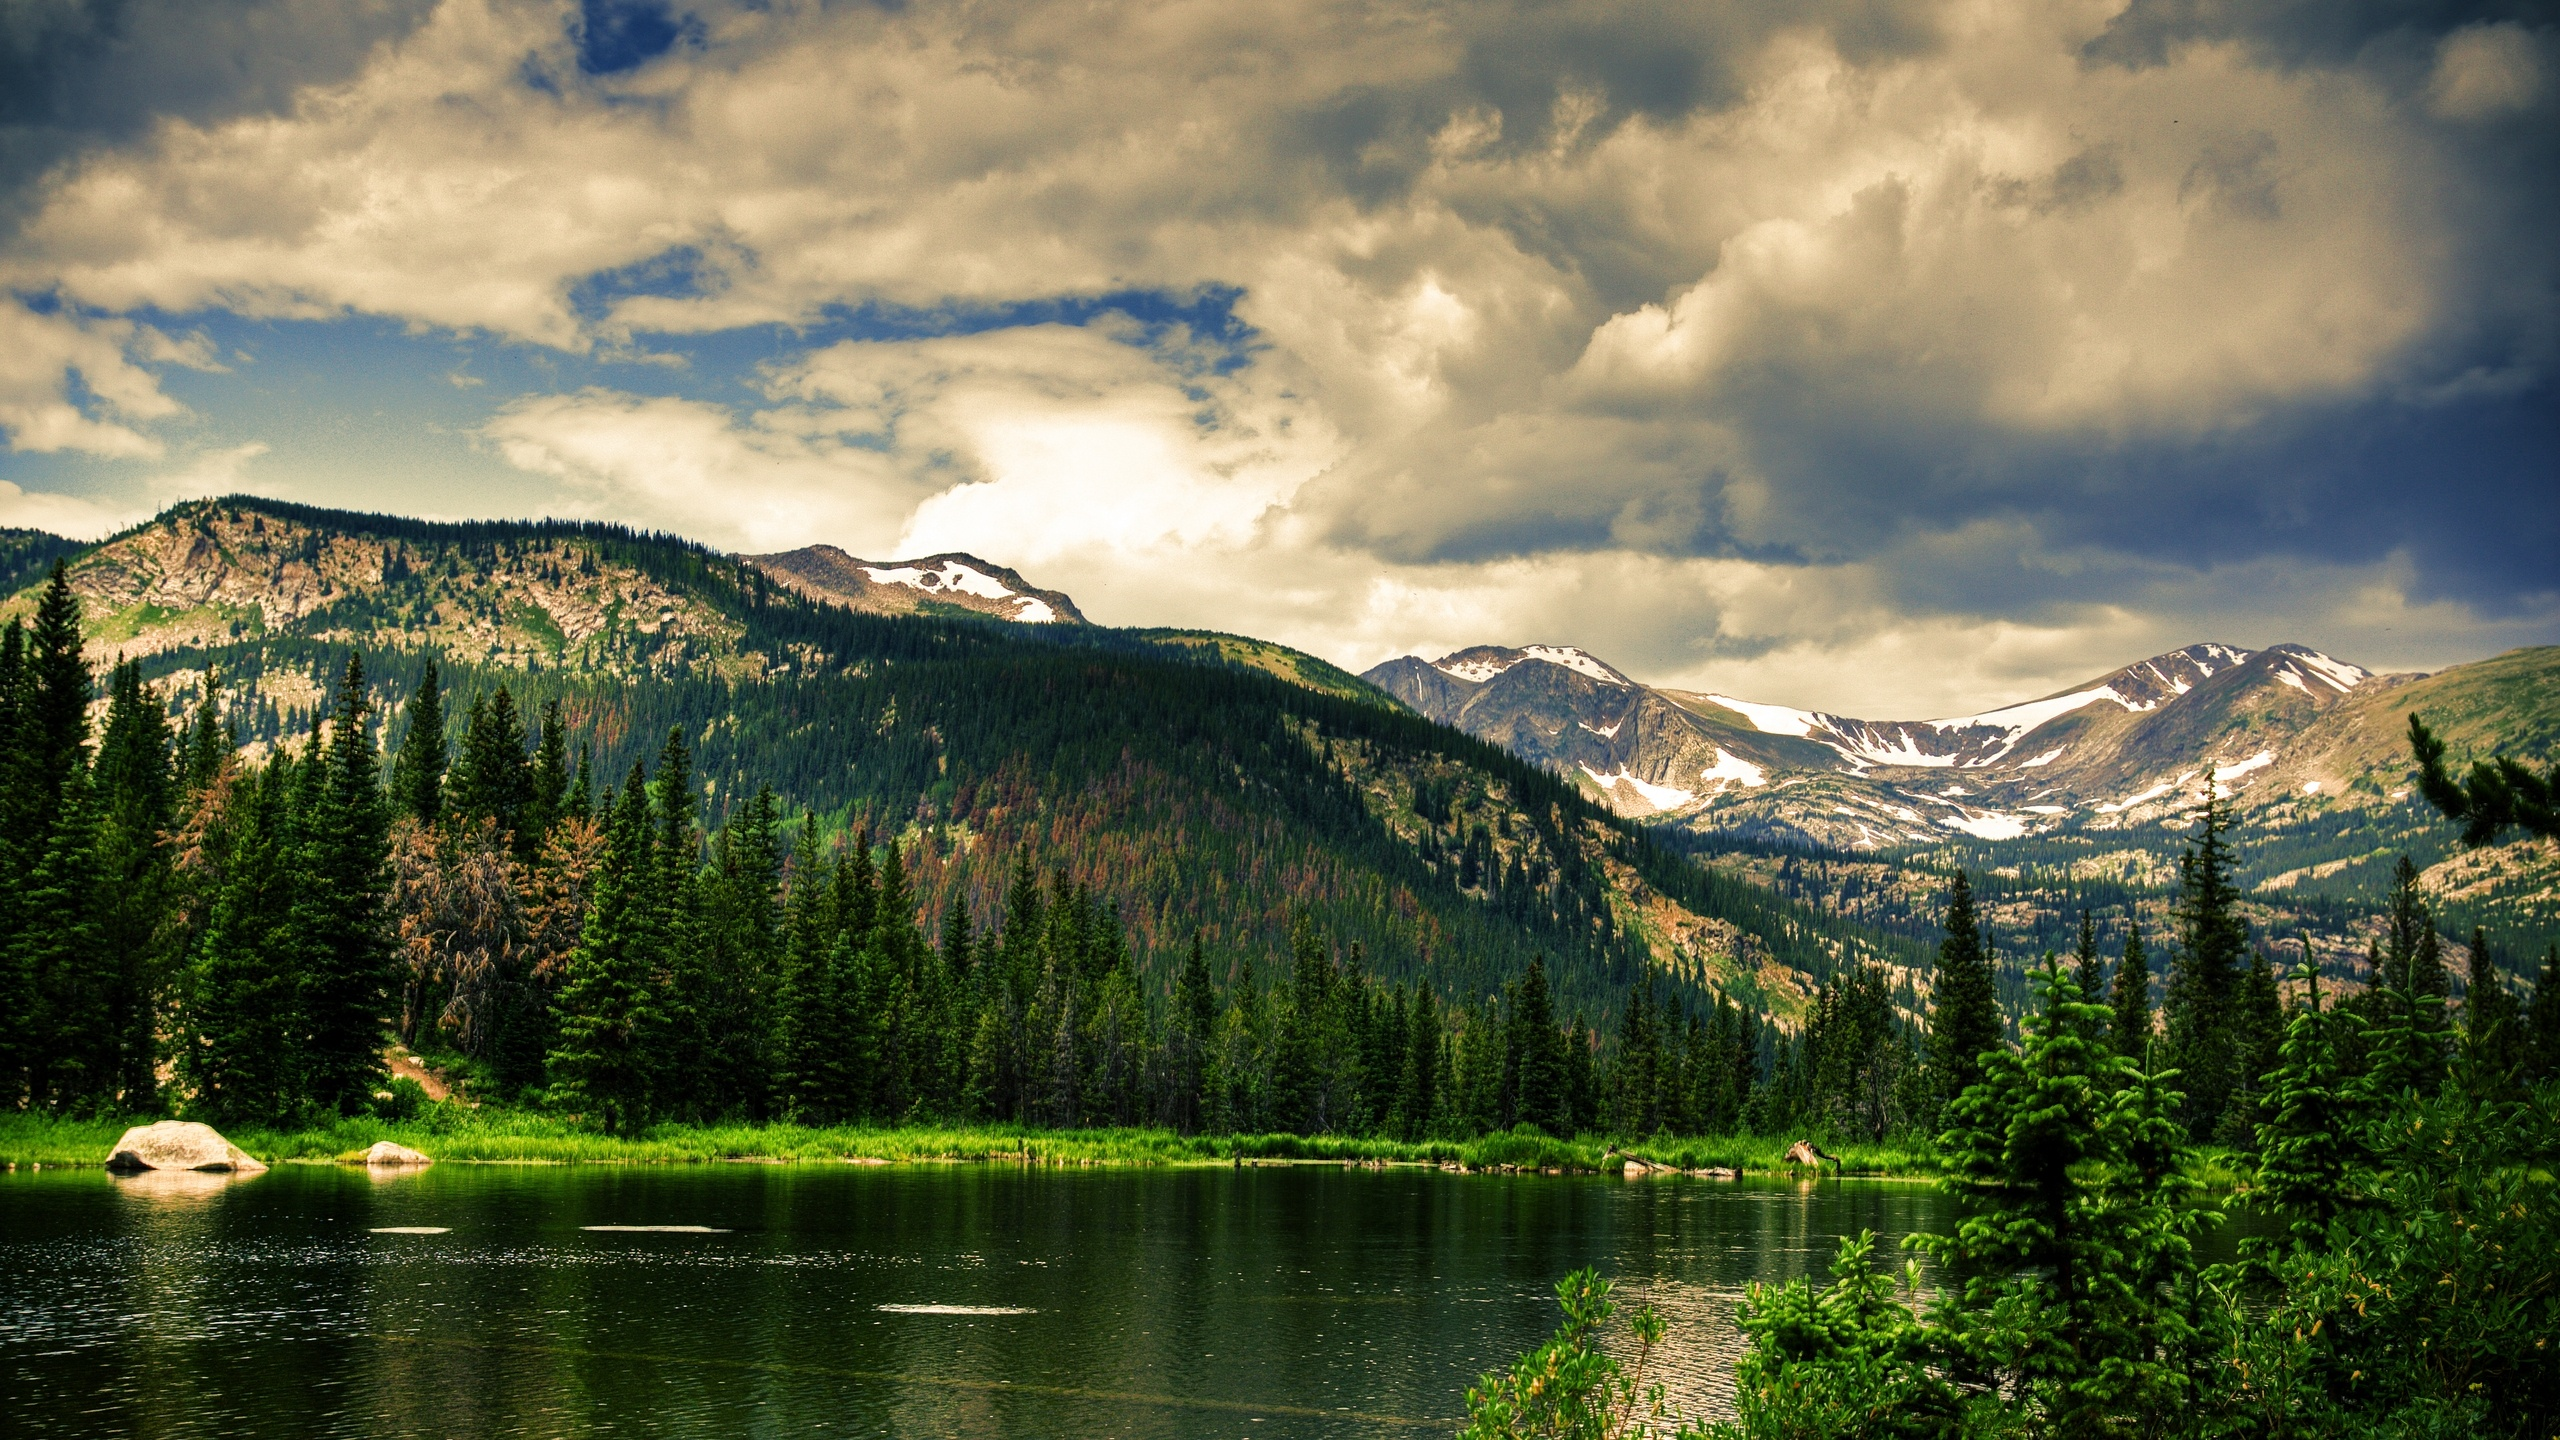 природа горы облака деревья река nature mountains clouds trees river  № 1000478 бесплатно